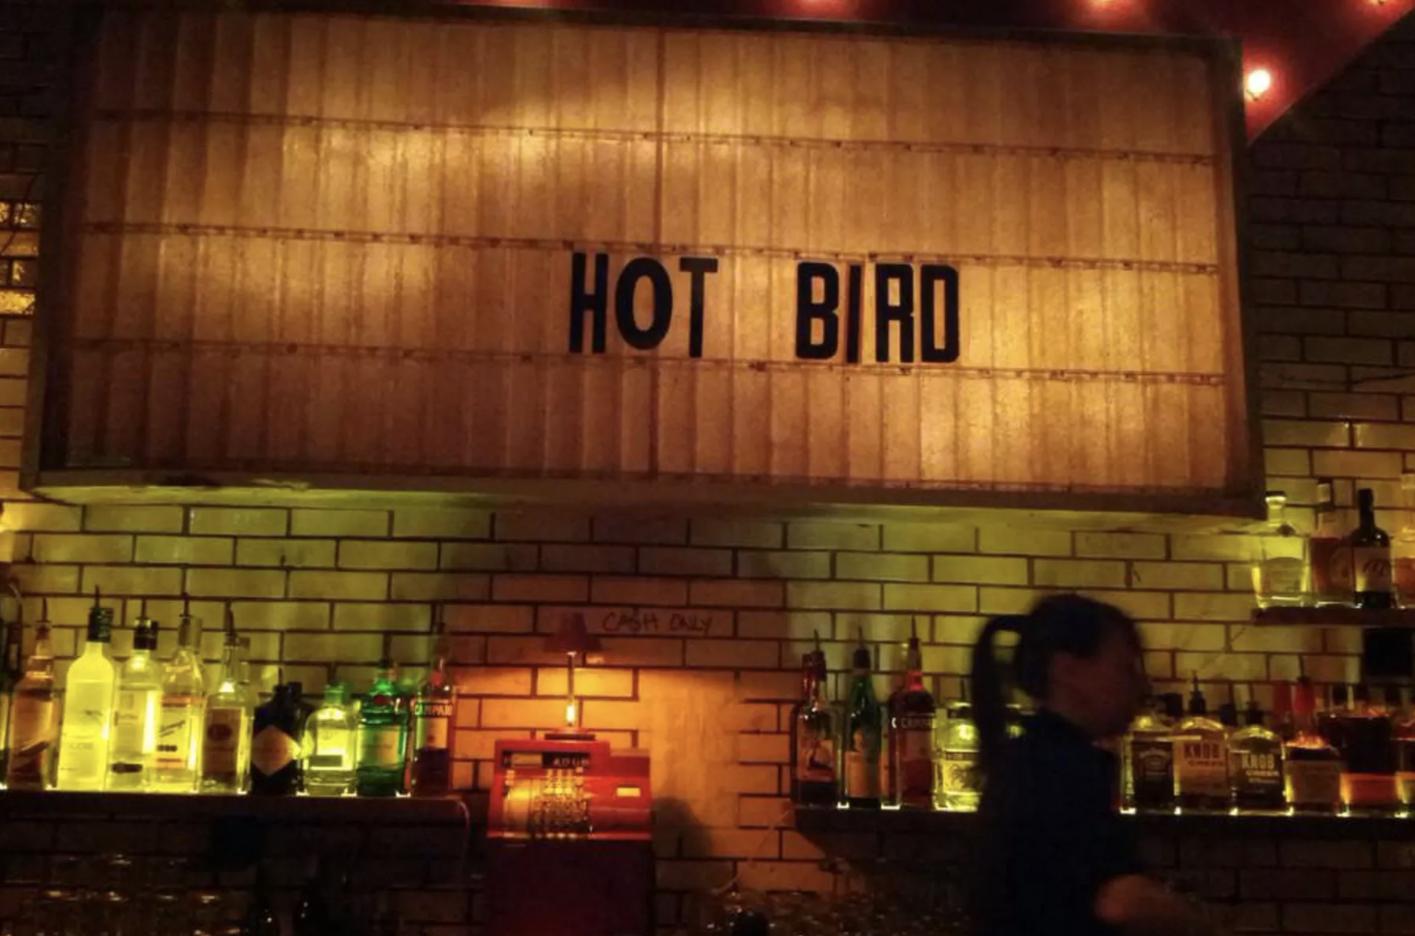 Hot Bird